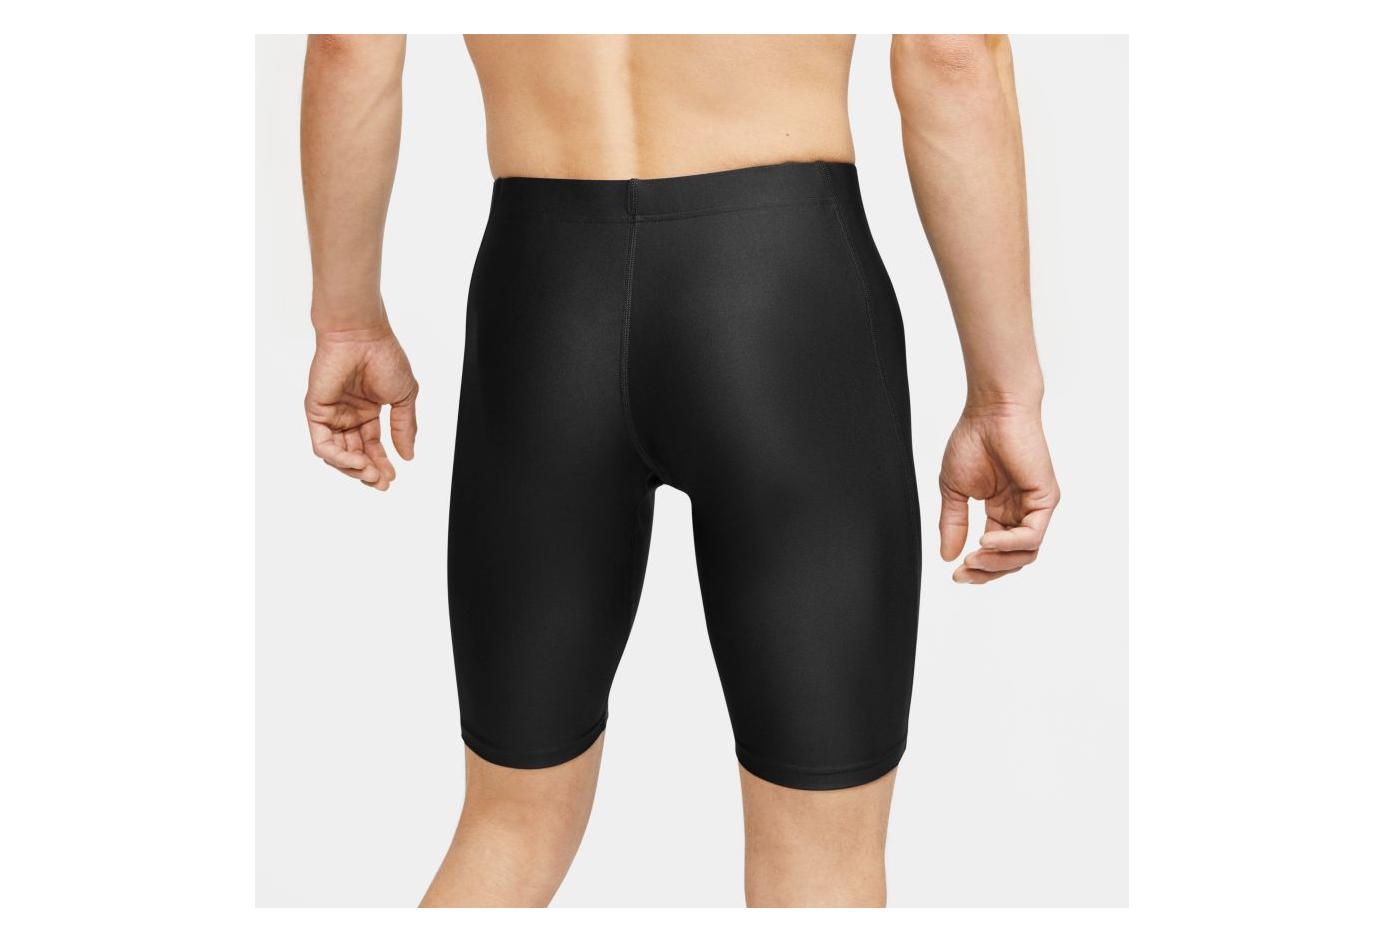 Nike Fast Black Men's Cycling Shorts